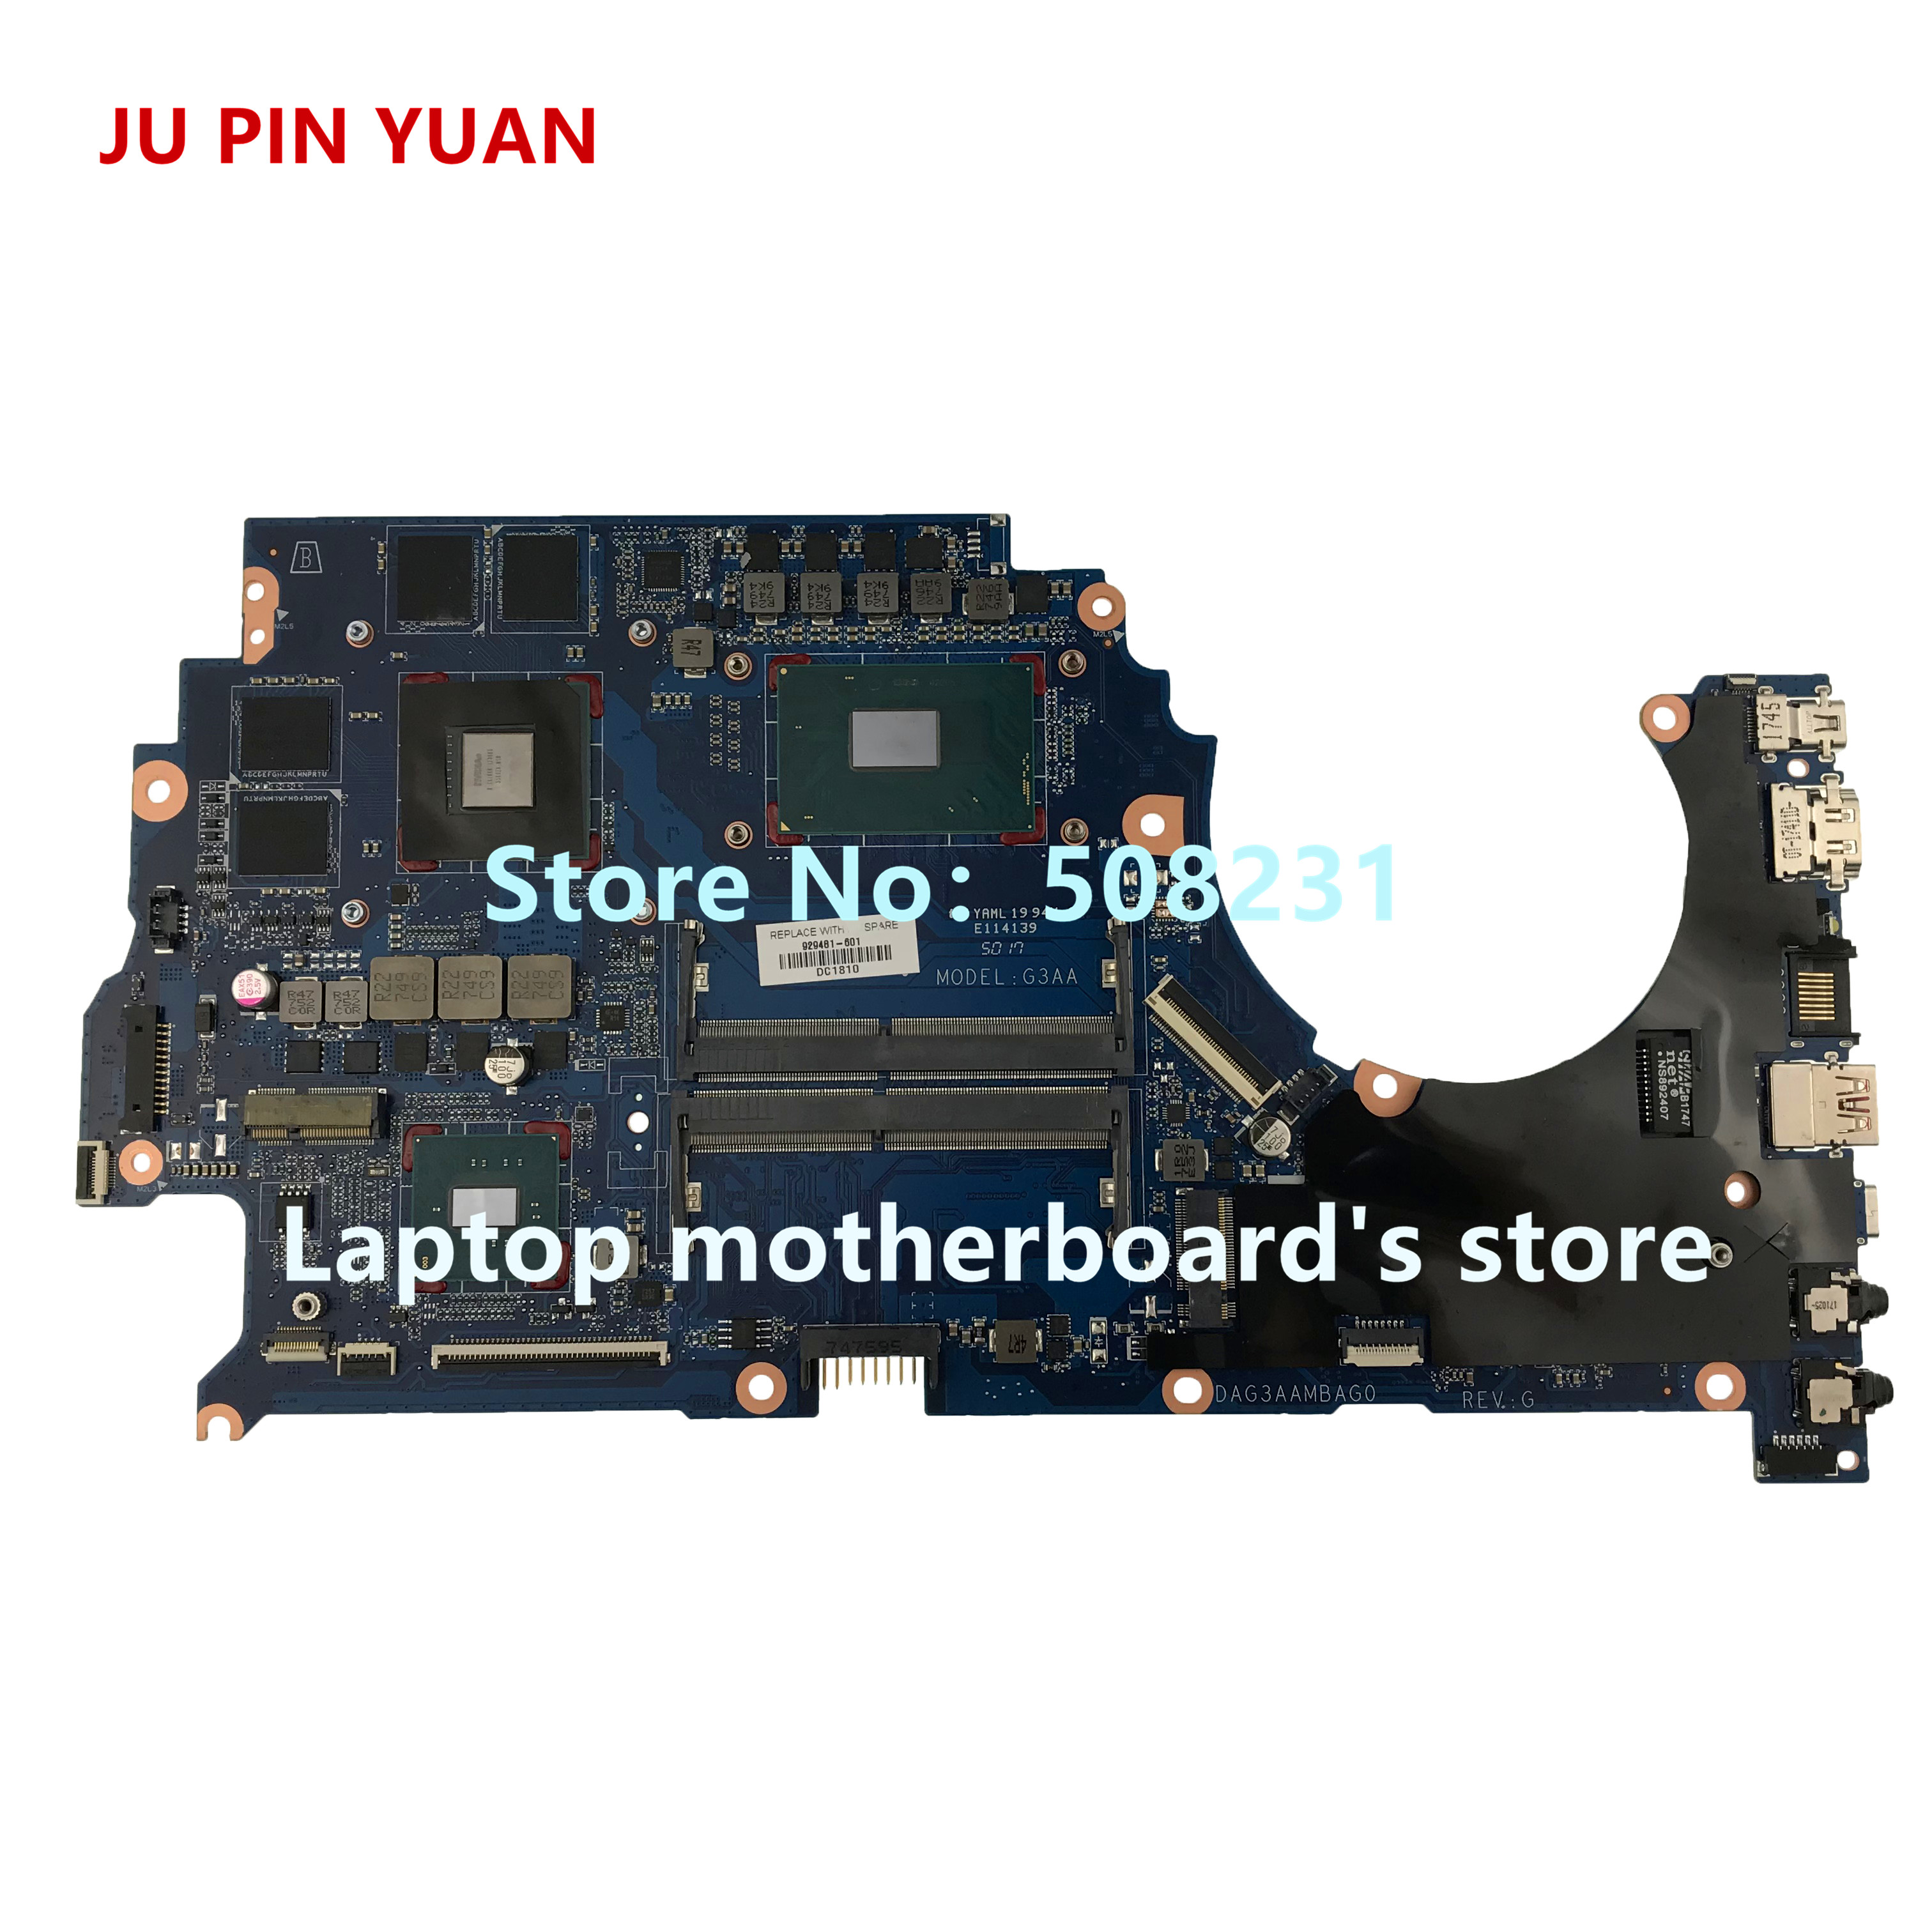 JU PIN YUAN 929481-601 G3AA DAG3AAMBAE0 placa base para presagio por ordenador portátil HP 15-ce Notebook PC GTX1050Ti 4 GB i7-7700HQ totalmente